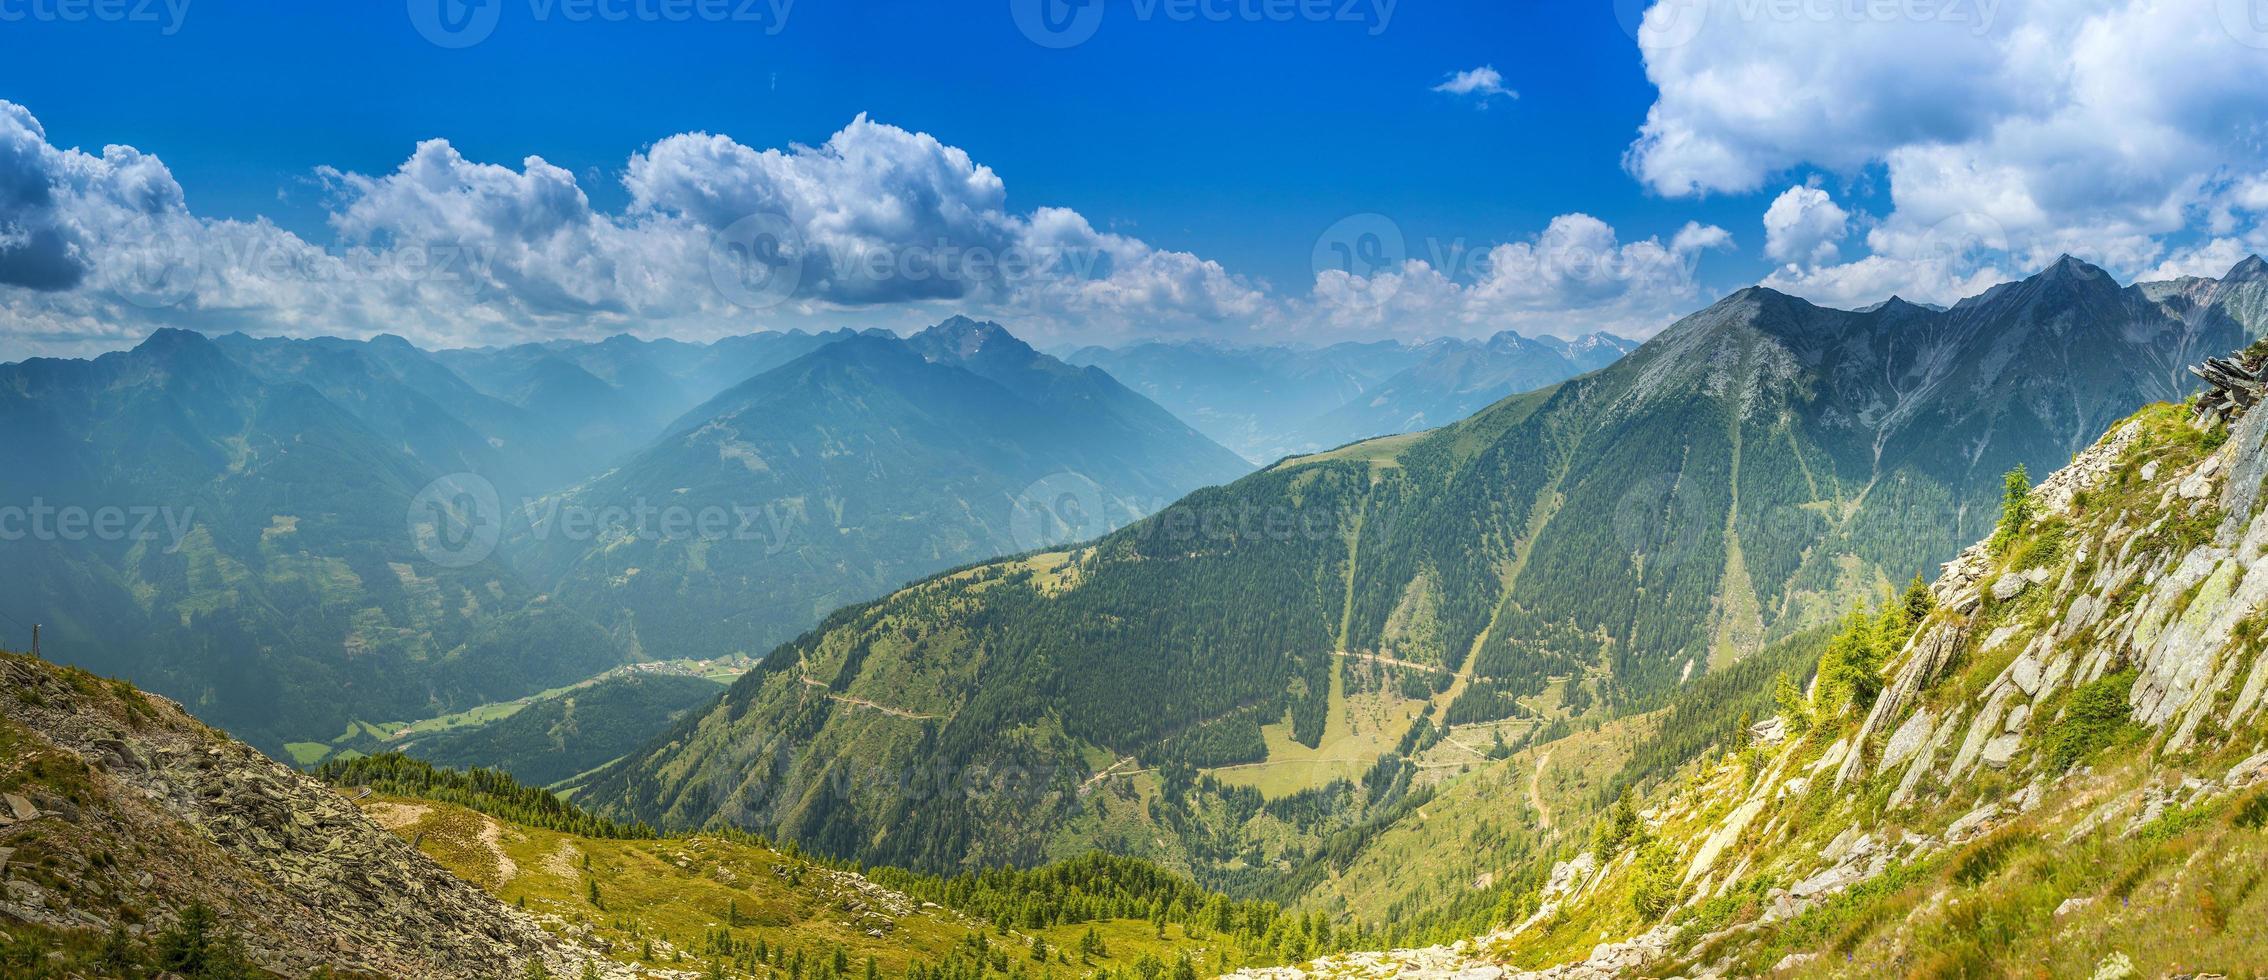 Alperna på sommaren foto